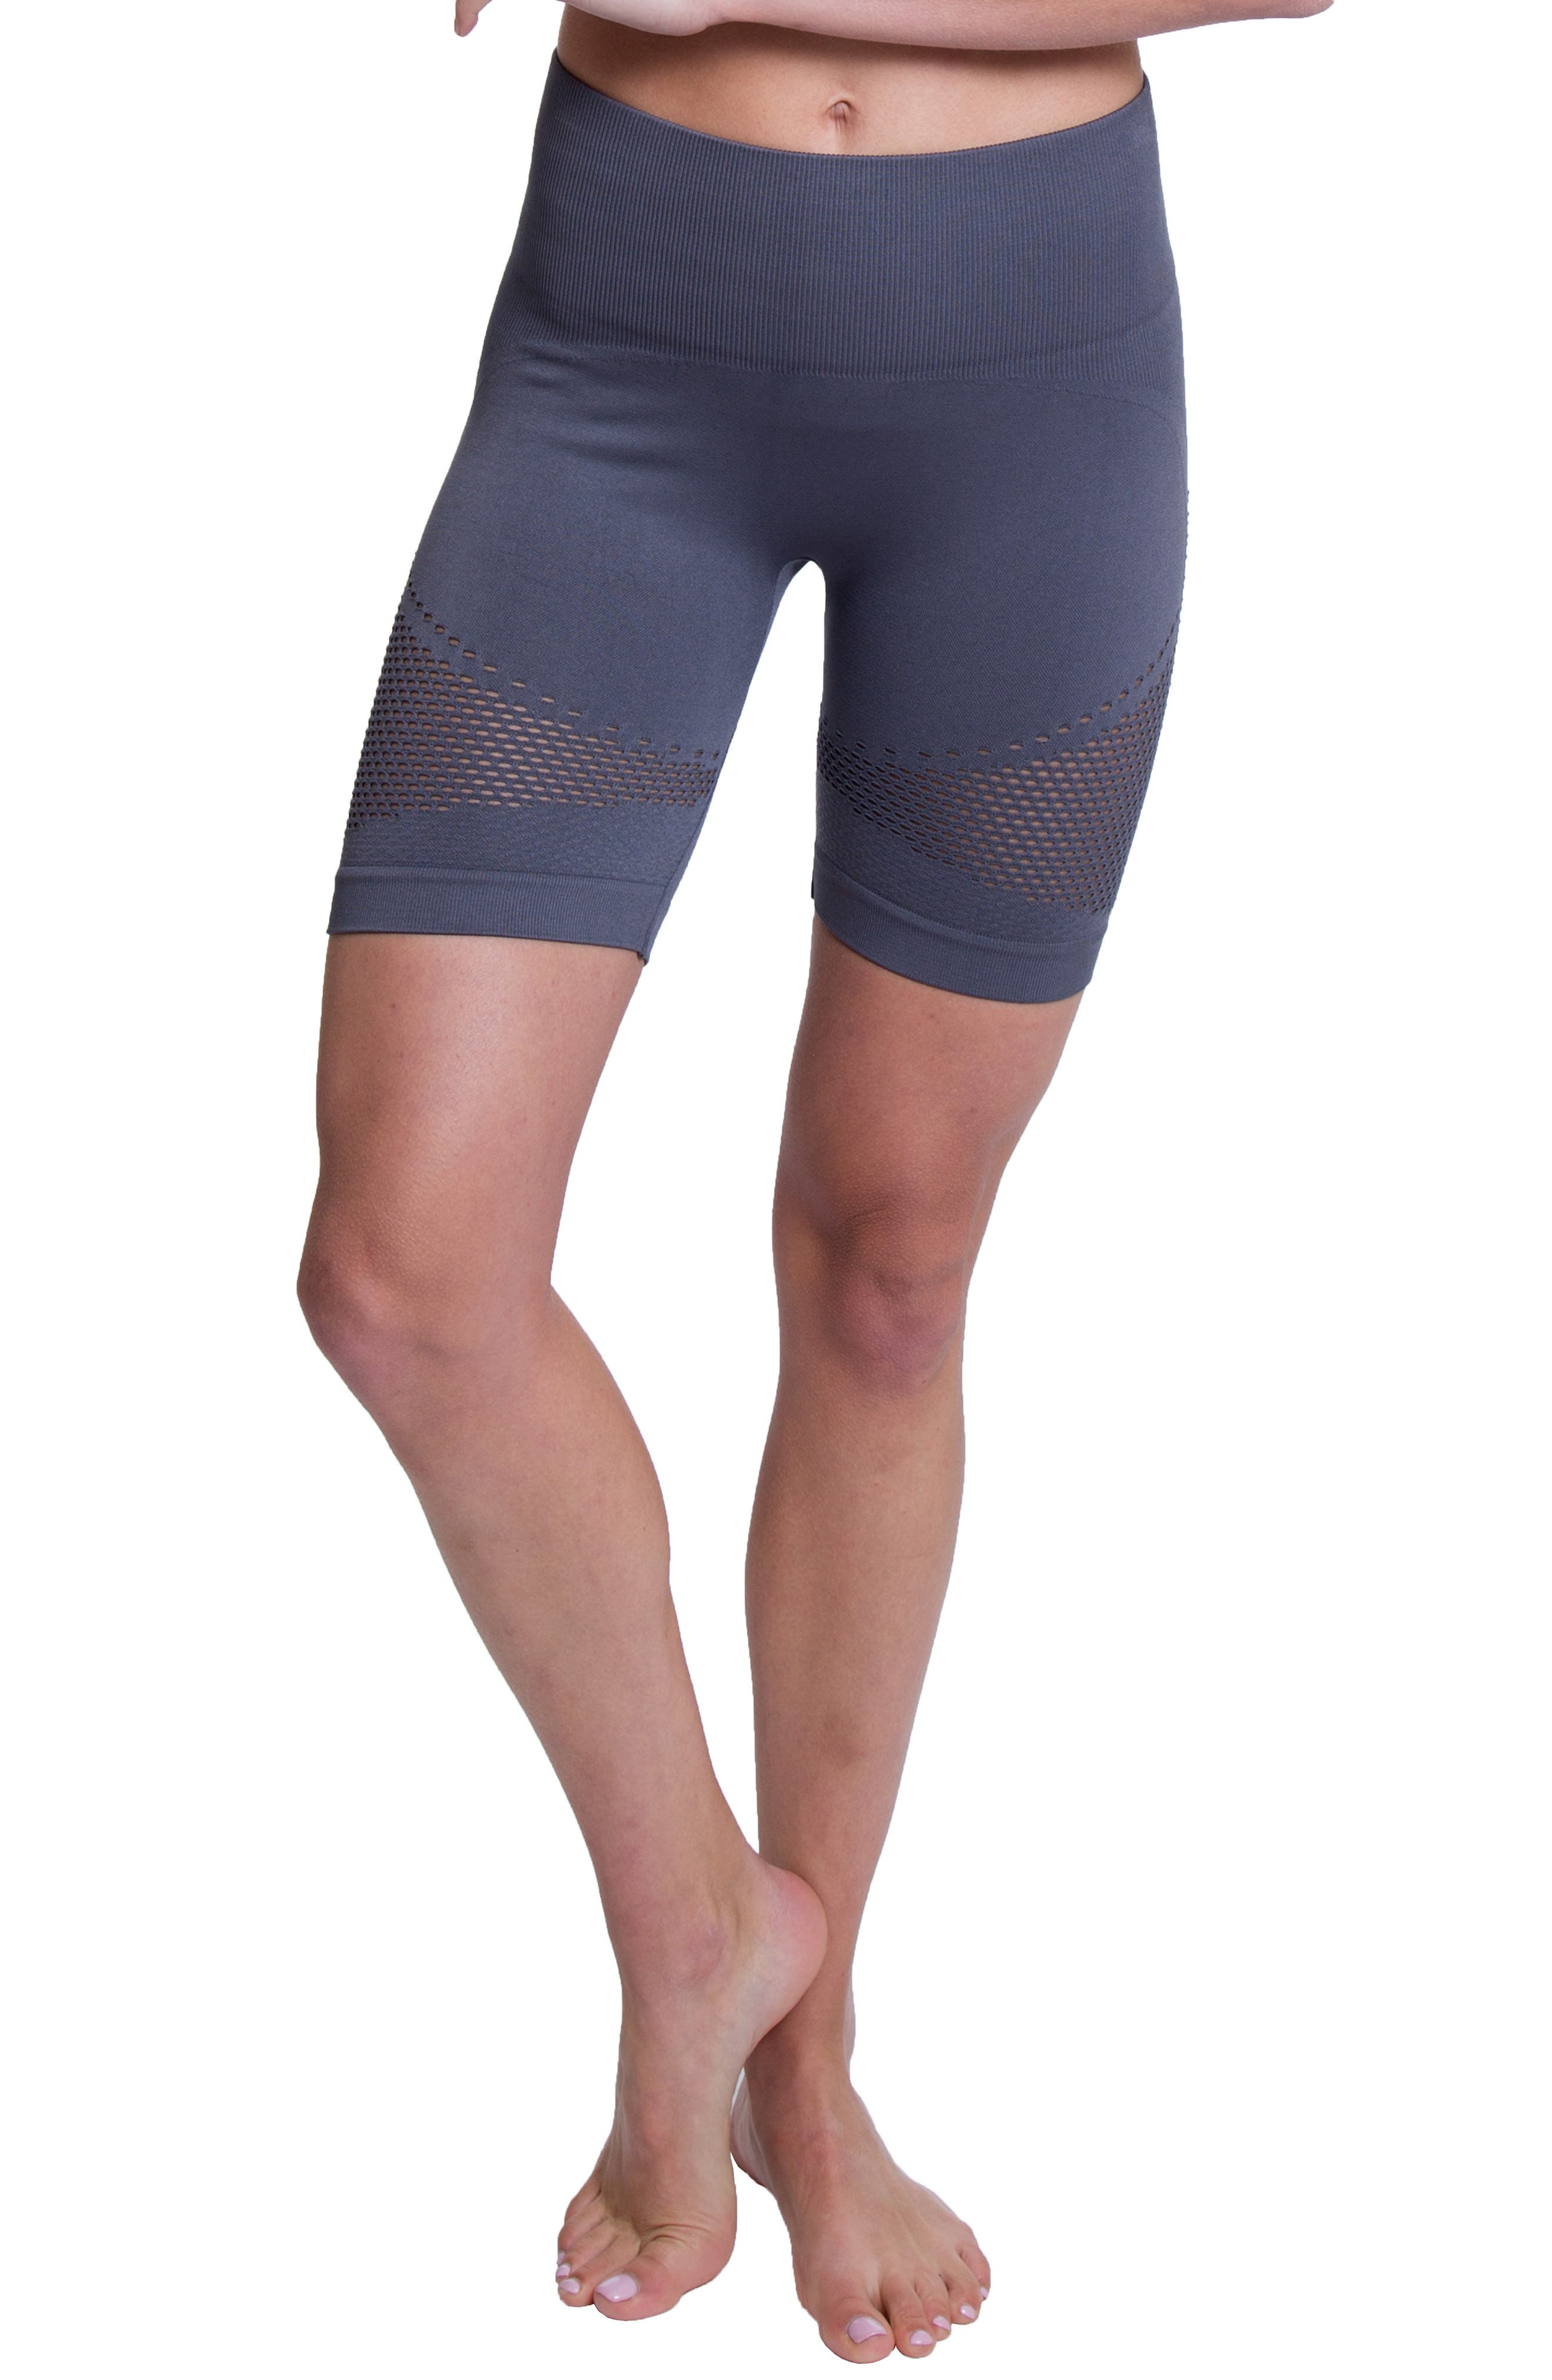 Momentum Seamless Biker Shorts,                             Main thumbnail 1, color,                             SHARK